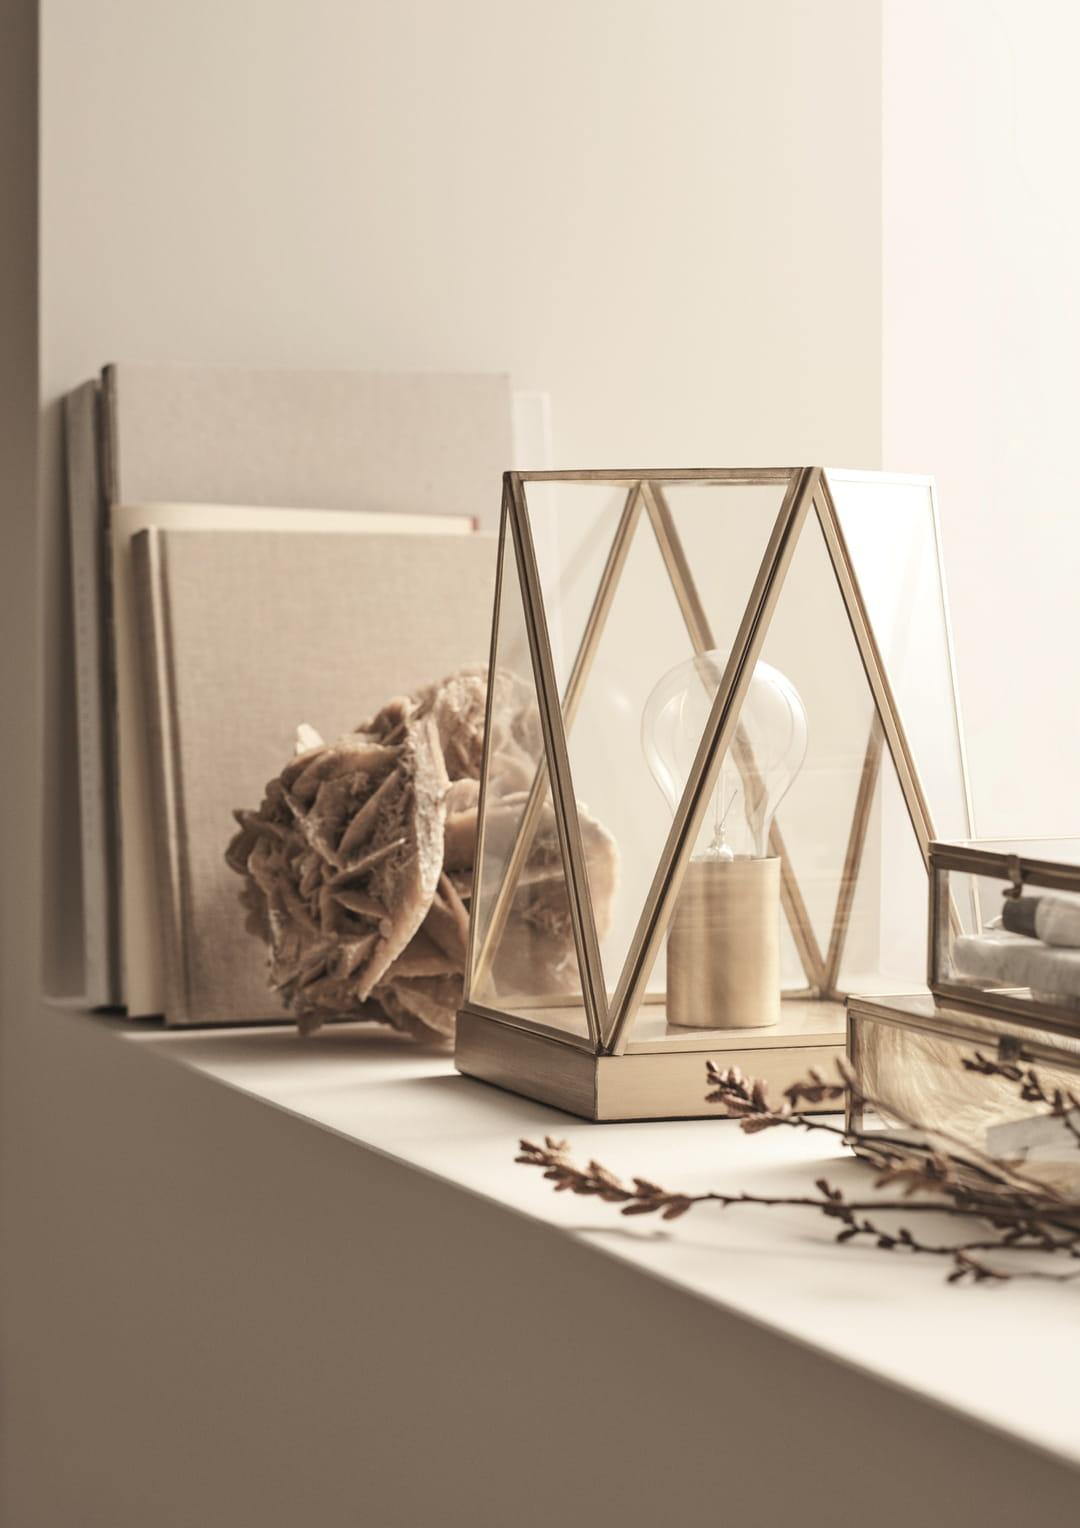 luminaire-laiton-h&m-home